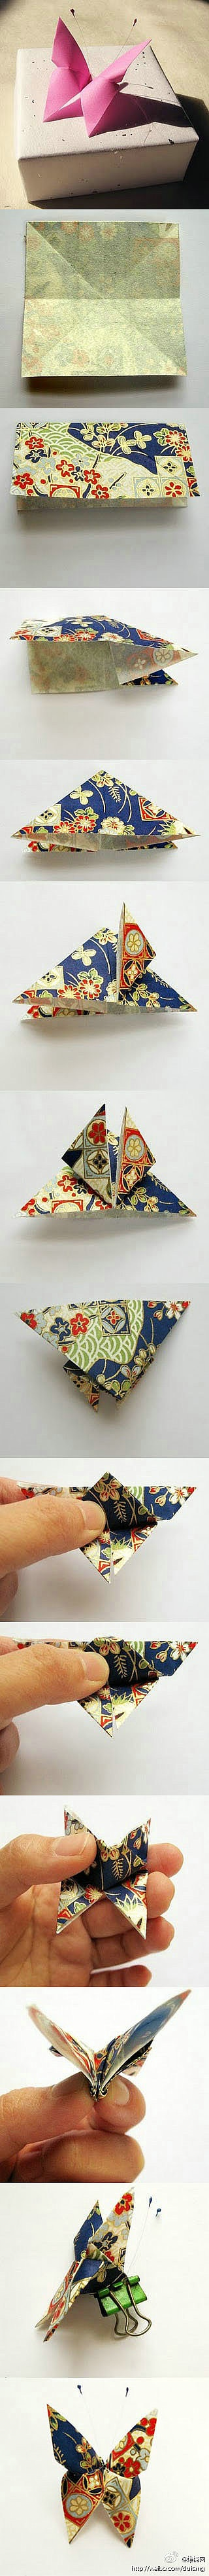 Best 8 Oregami Images On Pinterest Butterflies Paper Crafts And 3d Origami Swan Diagram Http Howtoorigamicom Origamiswanhtml Afbeeldingsresultaat Voor See More Surprise Just Join Us Zzkkocom